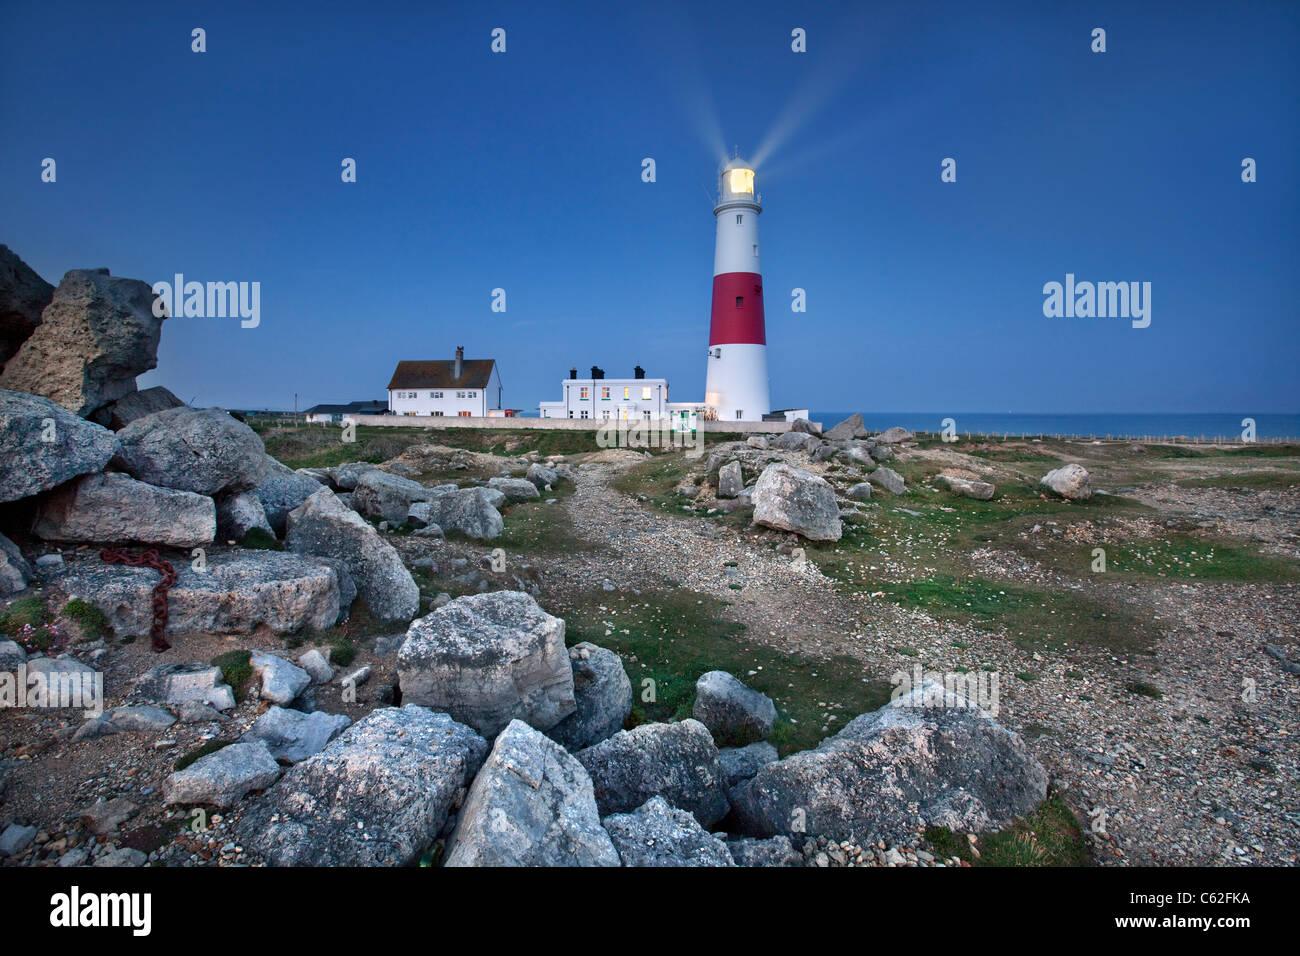 Faro de Portland Bill, Dorset. Imagen De Stock